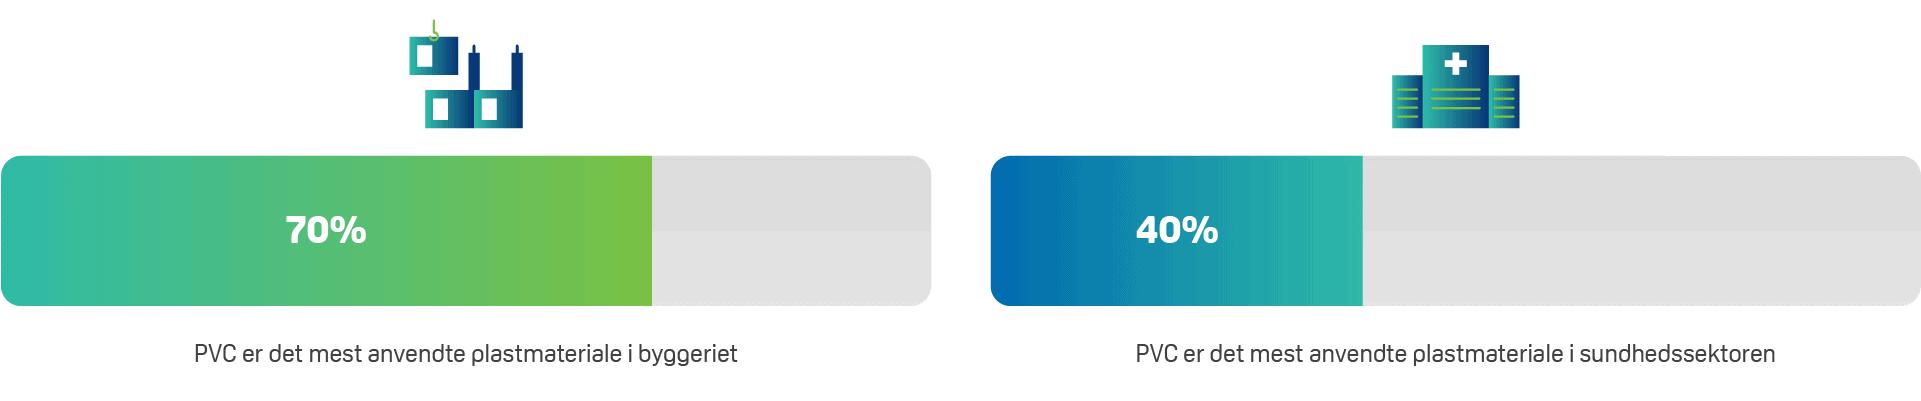 PVC-i-tal_Design_1_Anvendelsesomraader_B